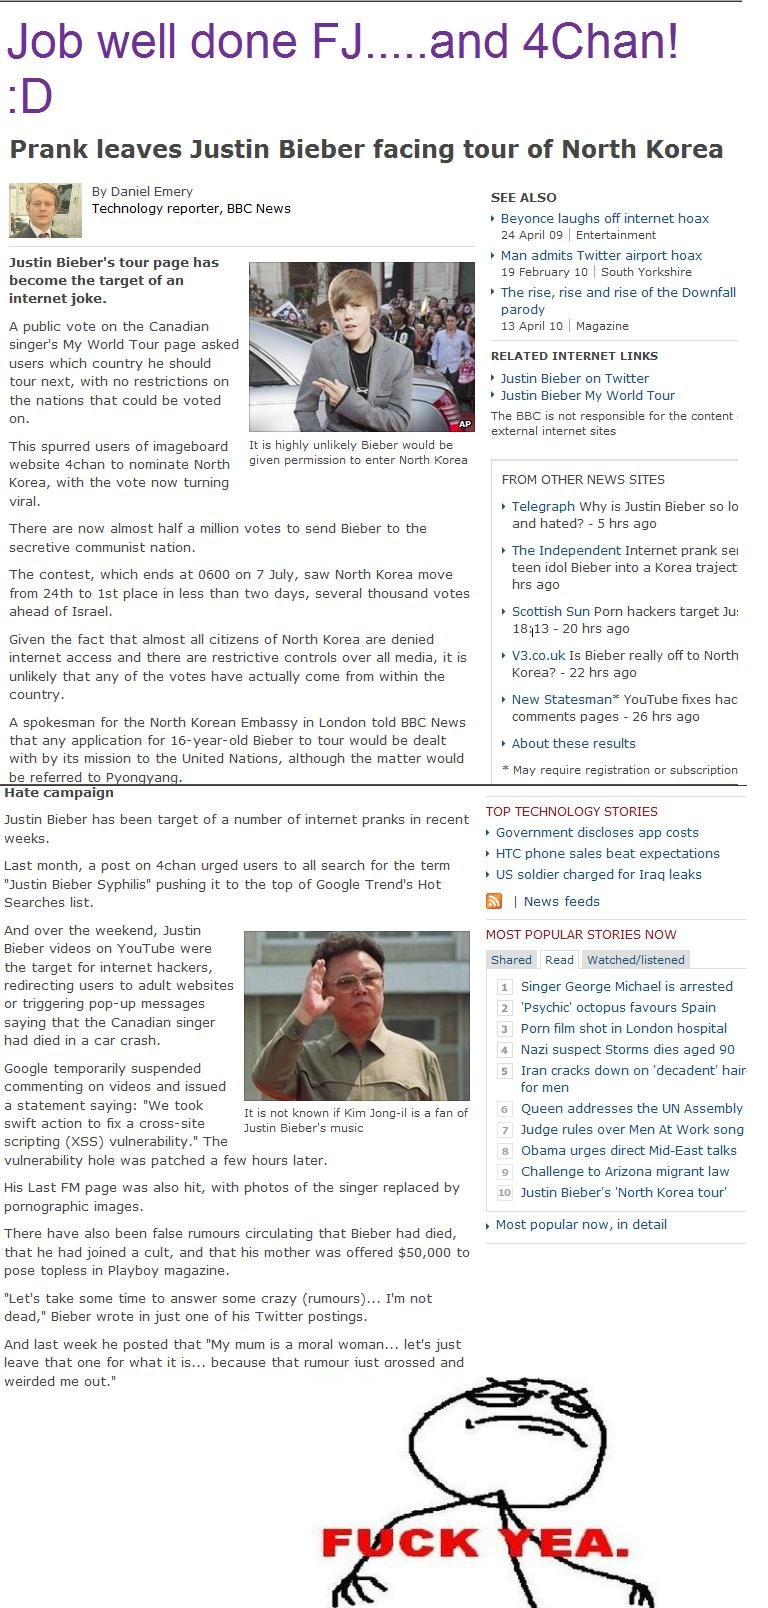 "Yeah. <a href="" target=_blank>news.bbc.co.uk/2/hi/technology/10506482.stm</a>."